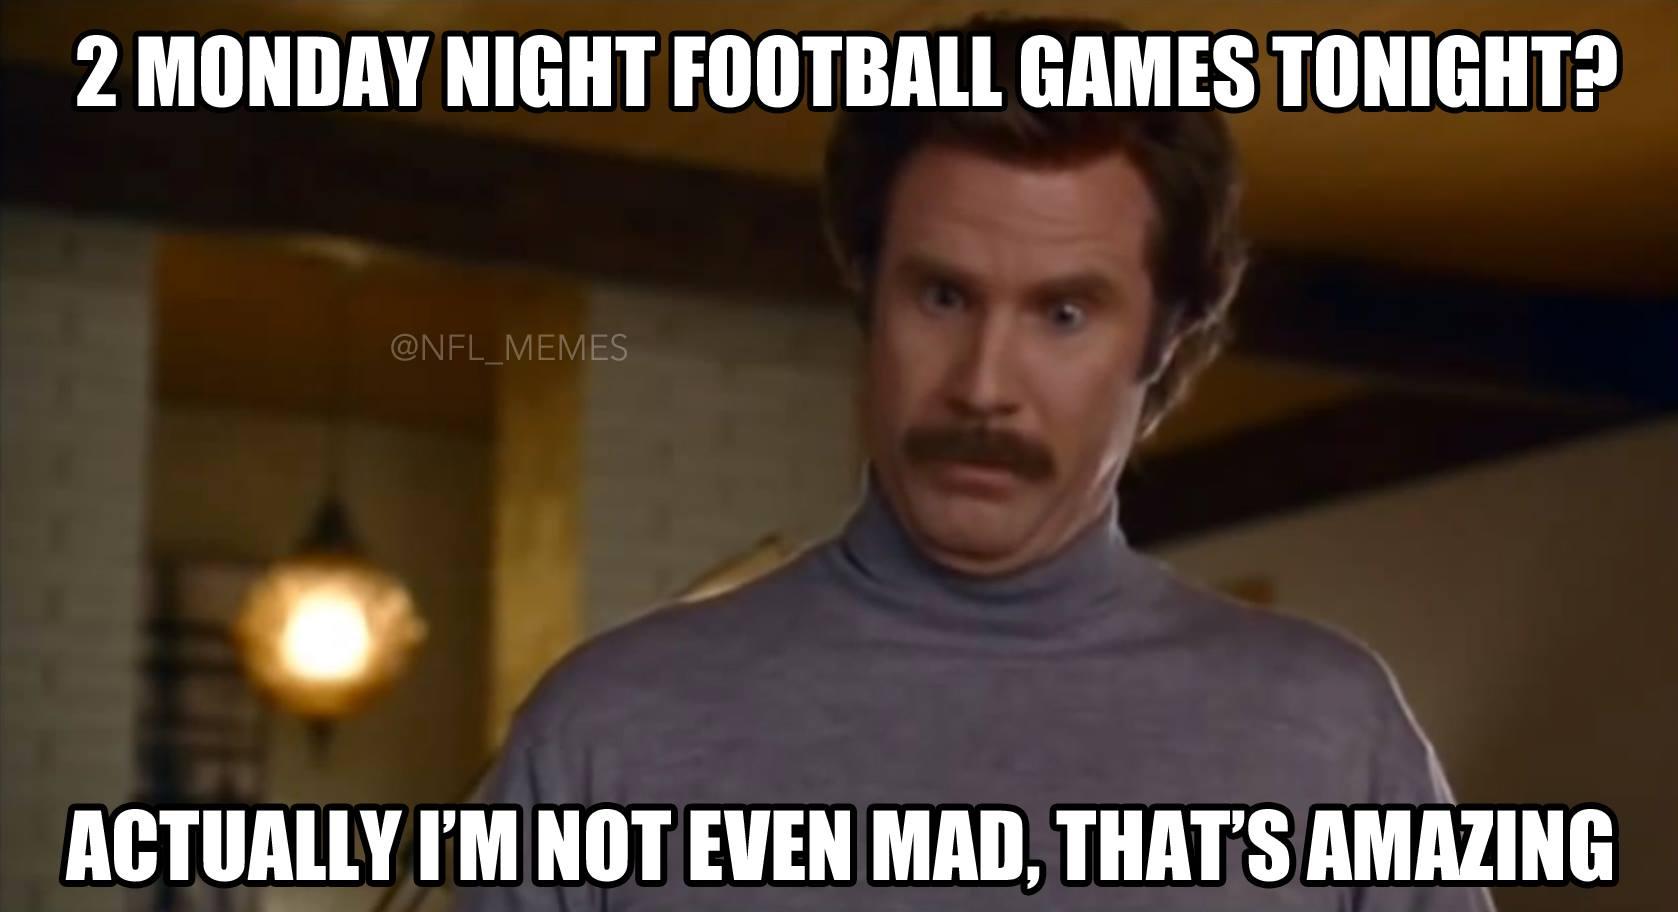 Nfl Memes On Twitter Two Monday Night Football Games Http T Co X5qnr5n5nx